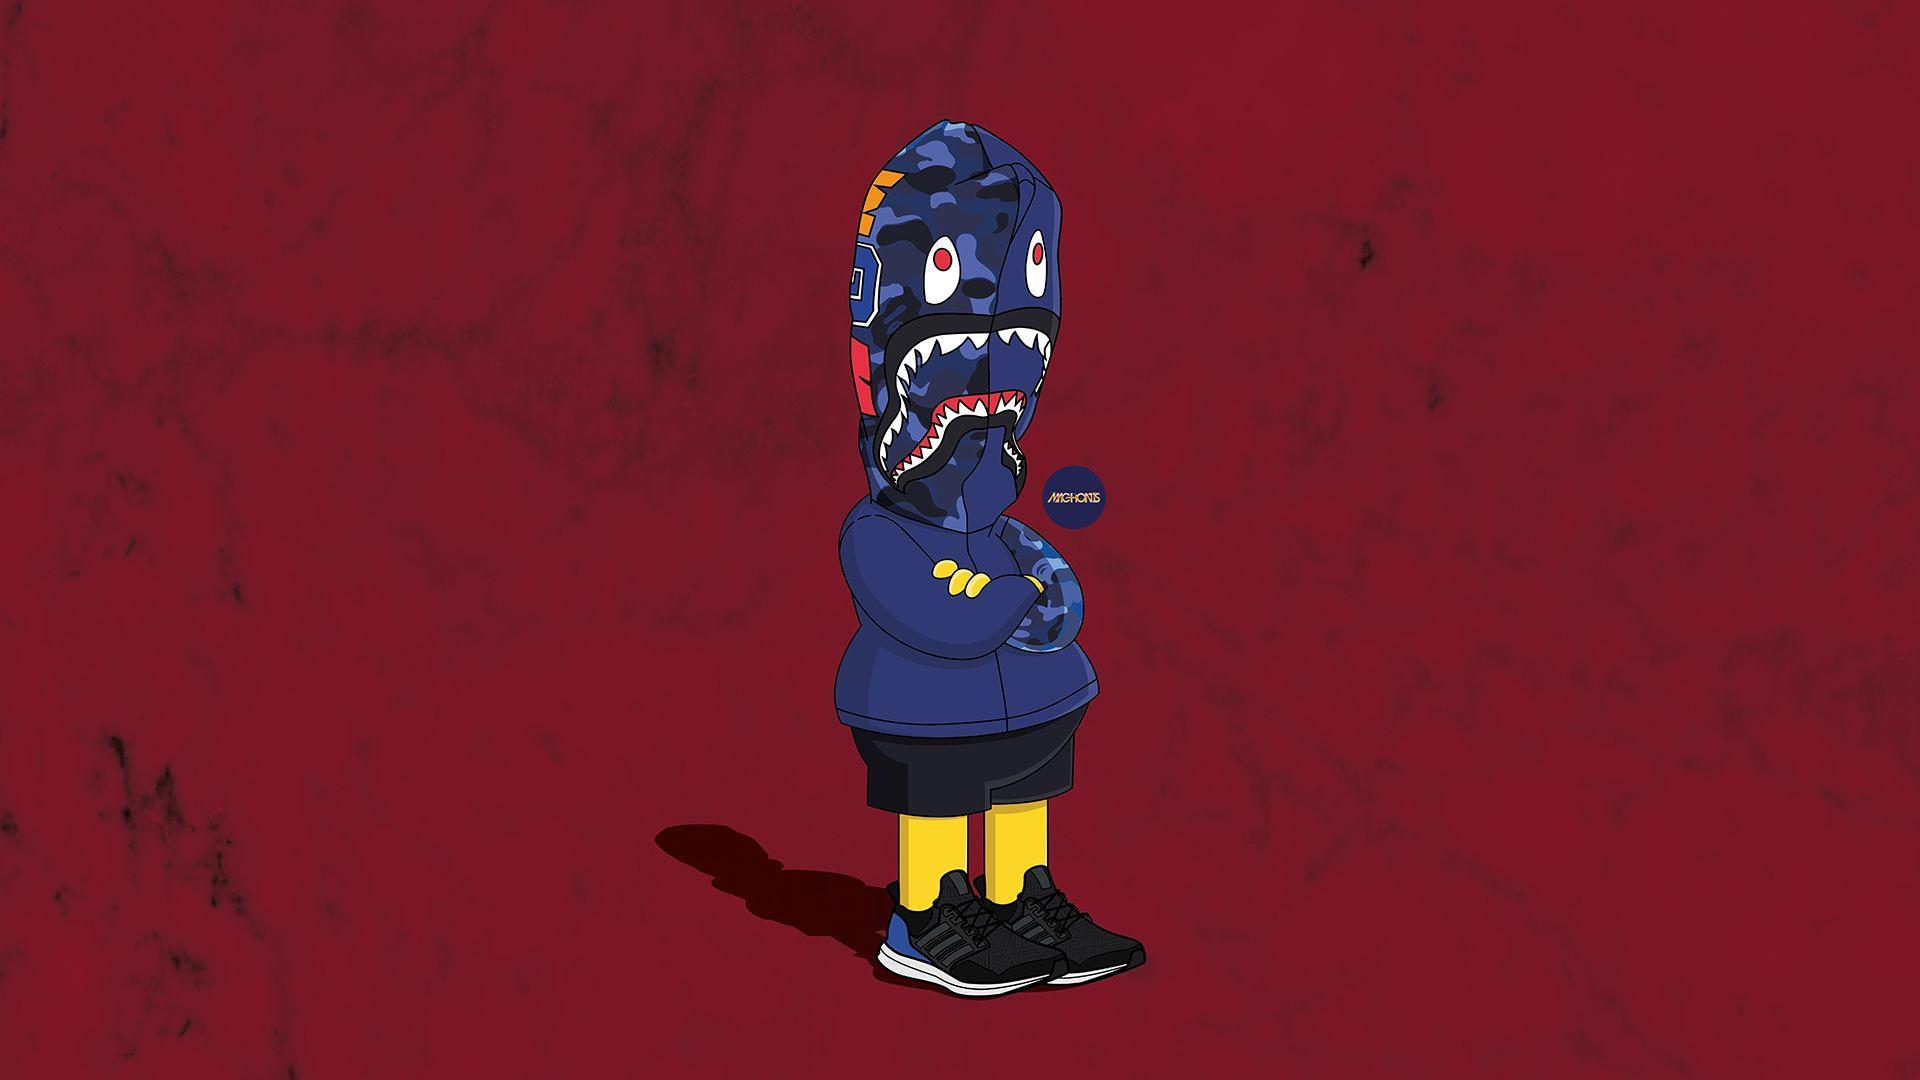 Hood Bart Simpson Supreme Wallpapers - Top Free Hood Bart ...